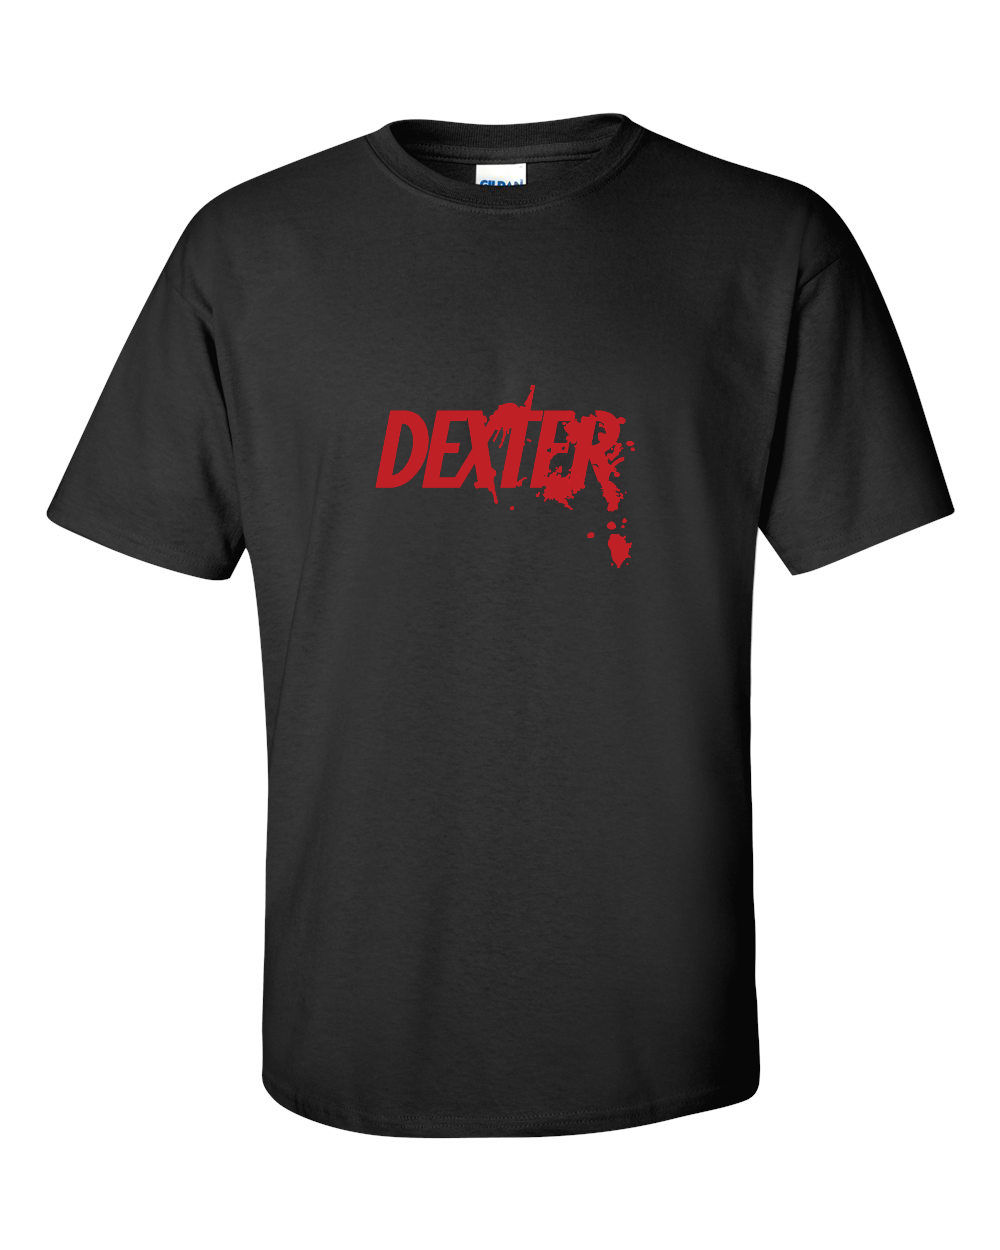 Camiseta con estampado de algodón de 100% para hombre, camiseta de Dexter con cuello redondo o diseño de salpicaduras de sangre, camiseta inspirada en Dvd de temporada